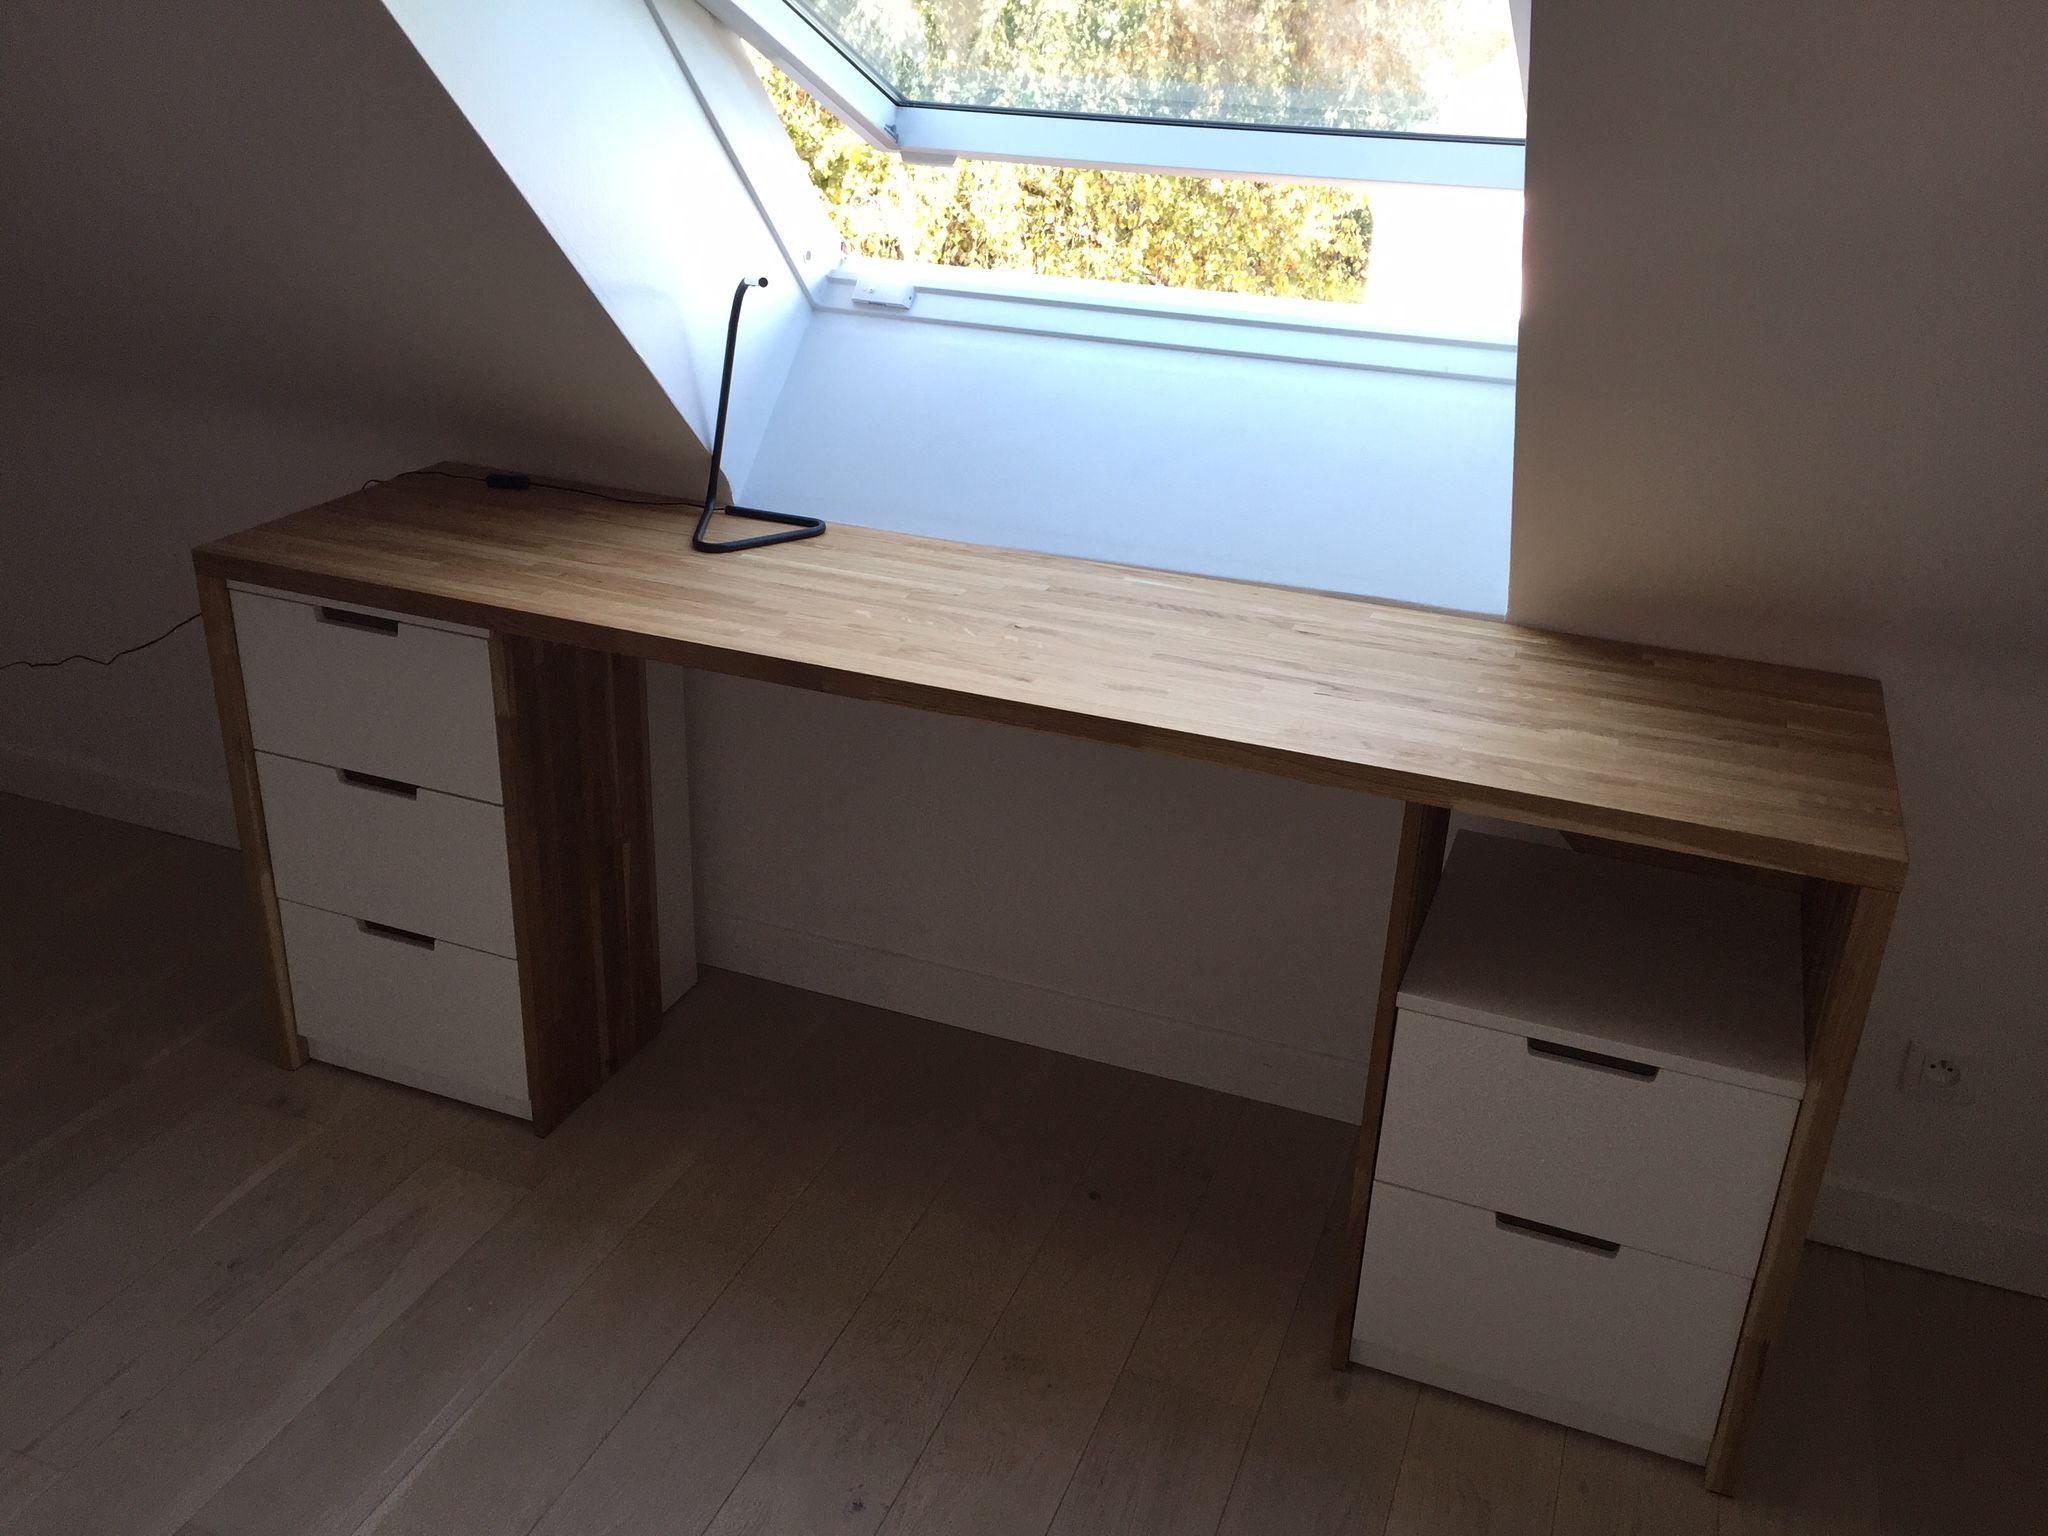 100 Incroyable Idées Bureau Plan De Travail Ikea